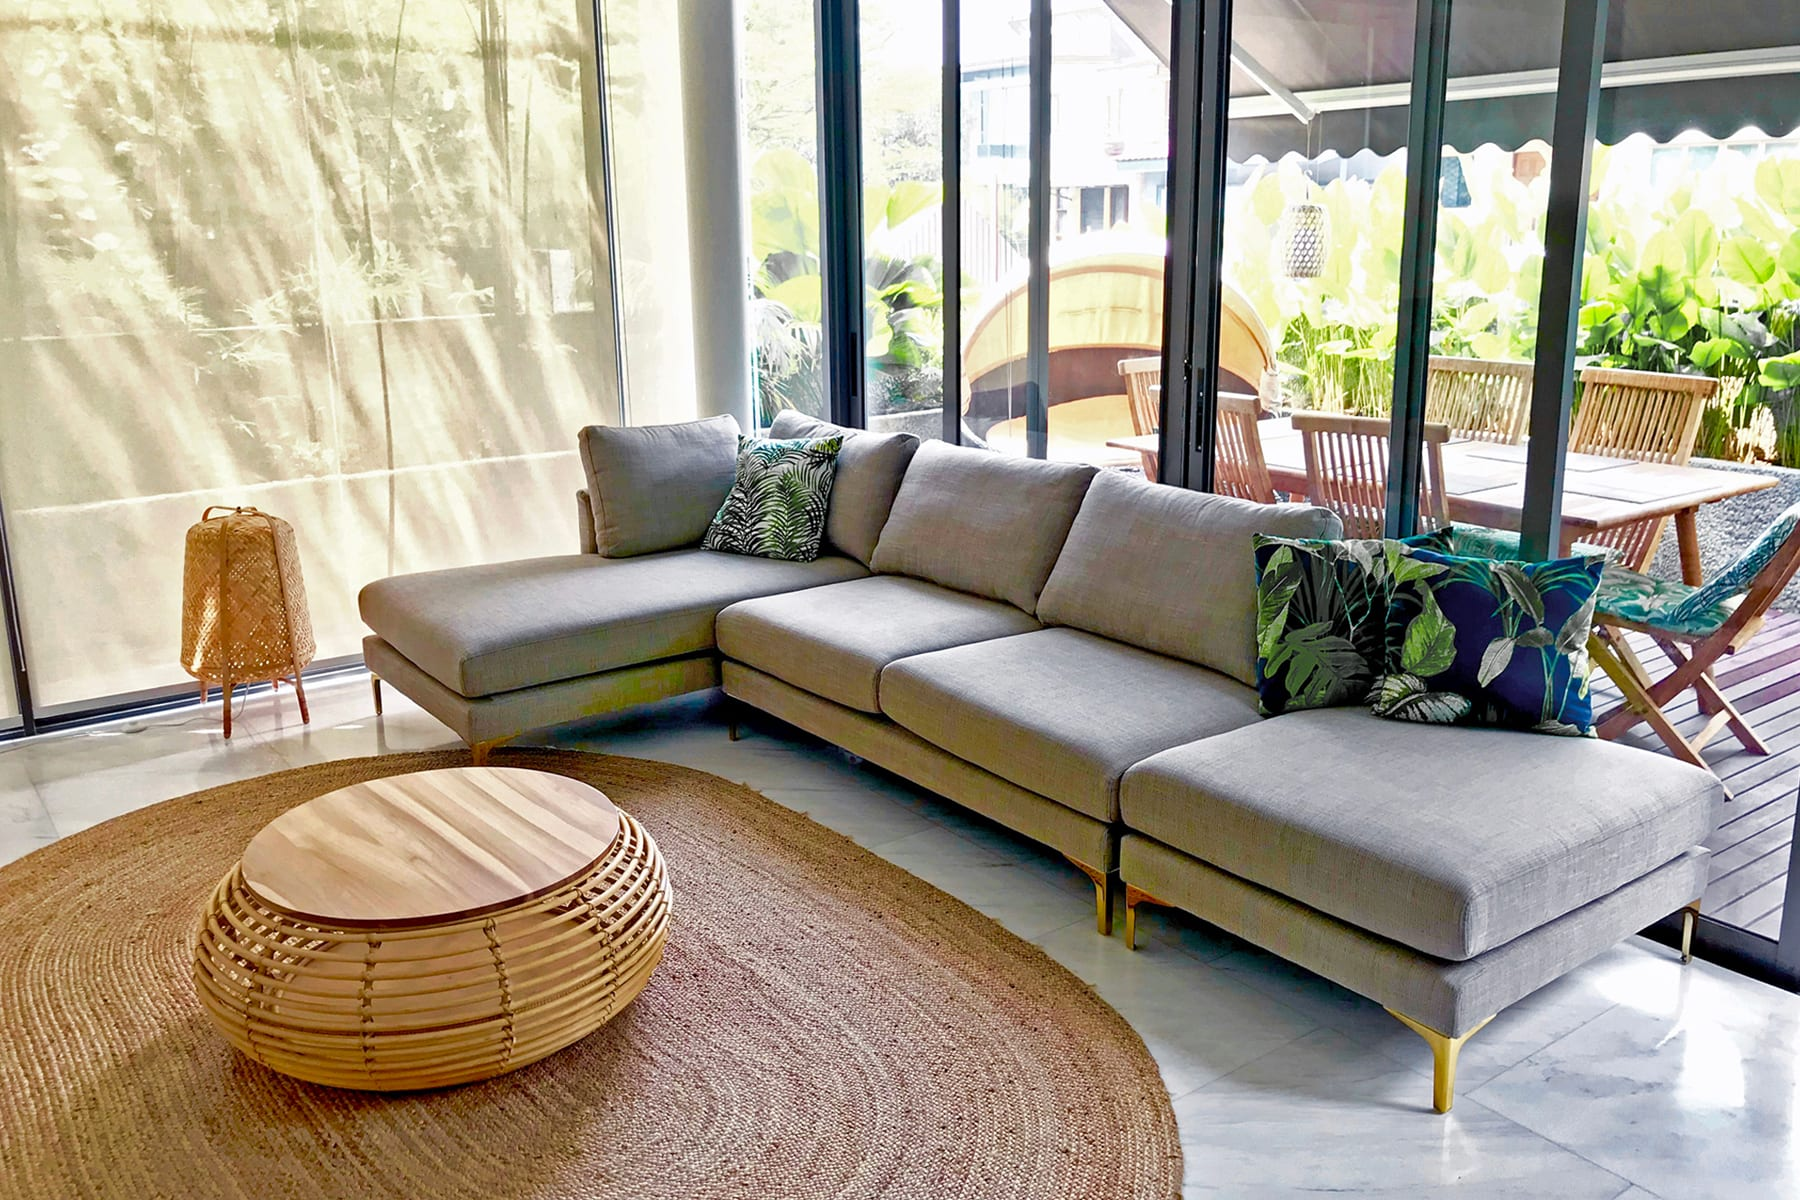 modular chaise sectional sofa and rattan coffee table